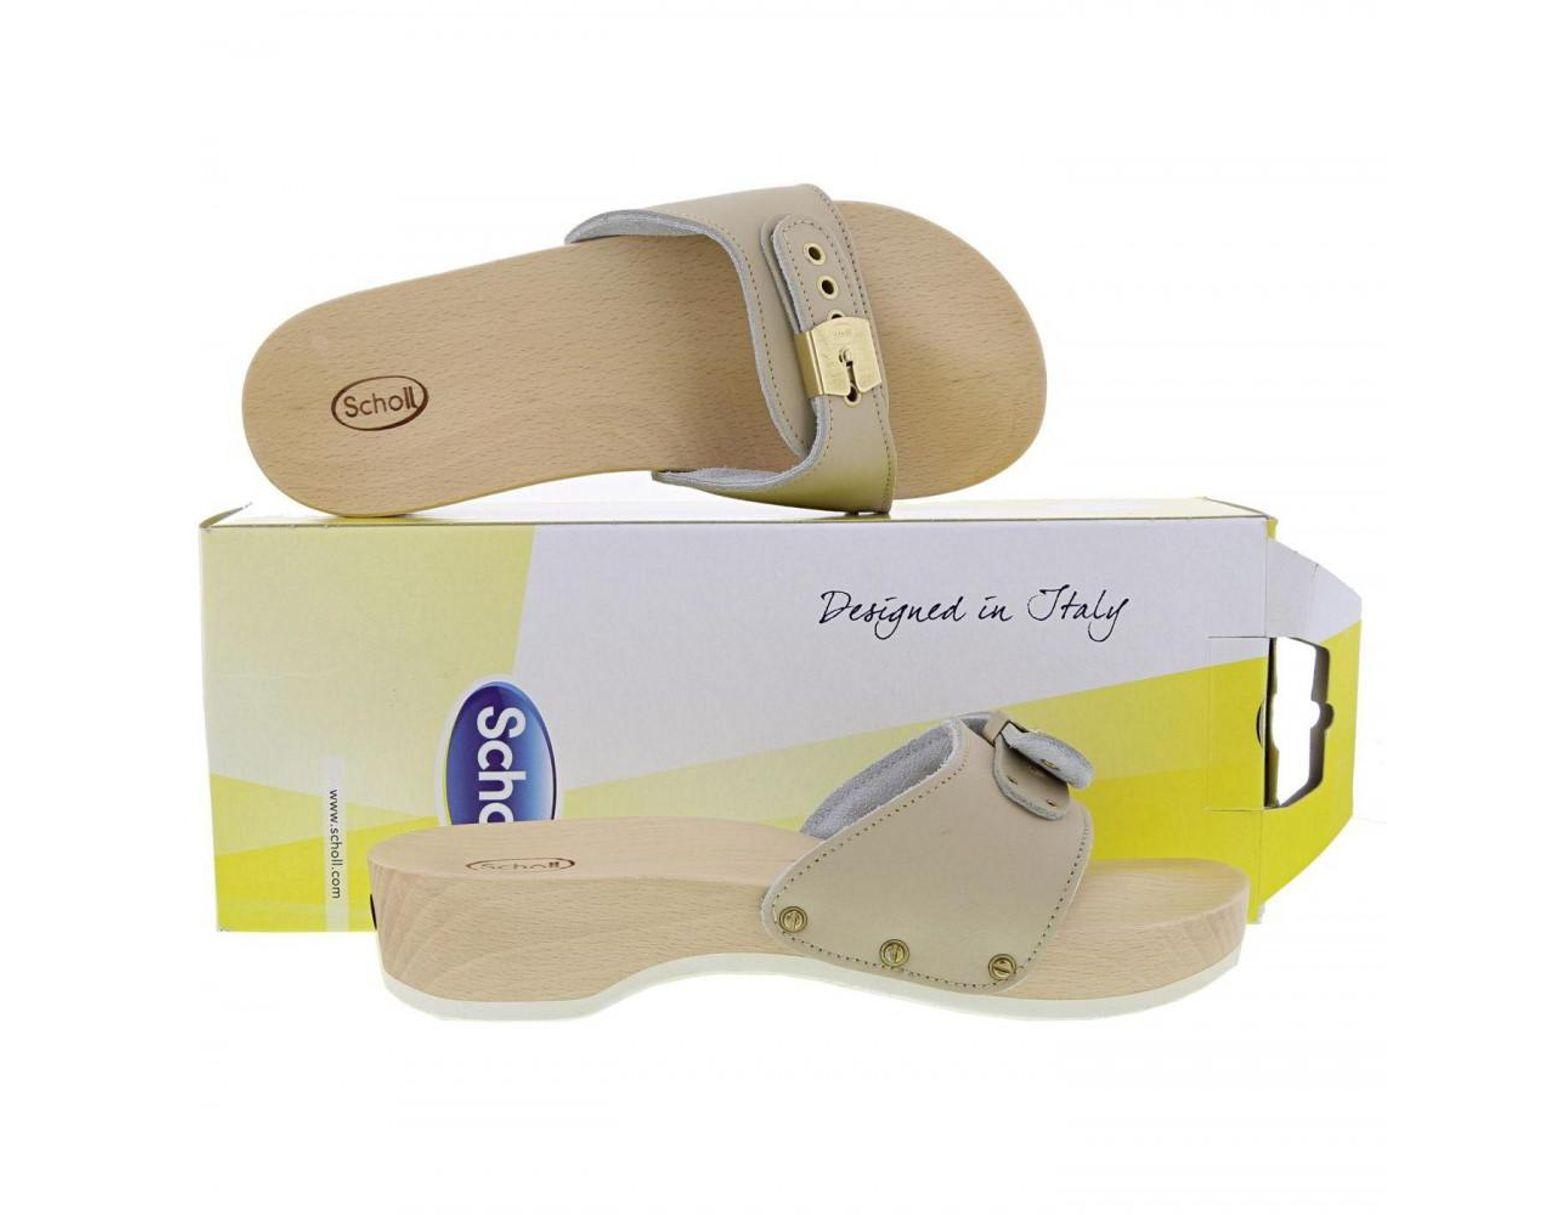 Pescura Heel Sandals Wooden Slide Scholl Lyst Clogs In Vzmquglsp Natural 5qAc4j3RSL